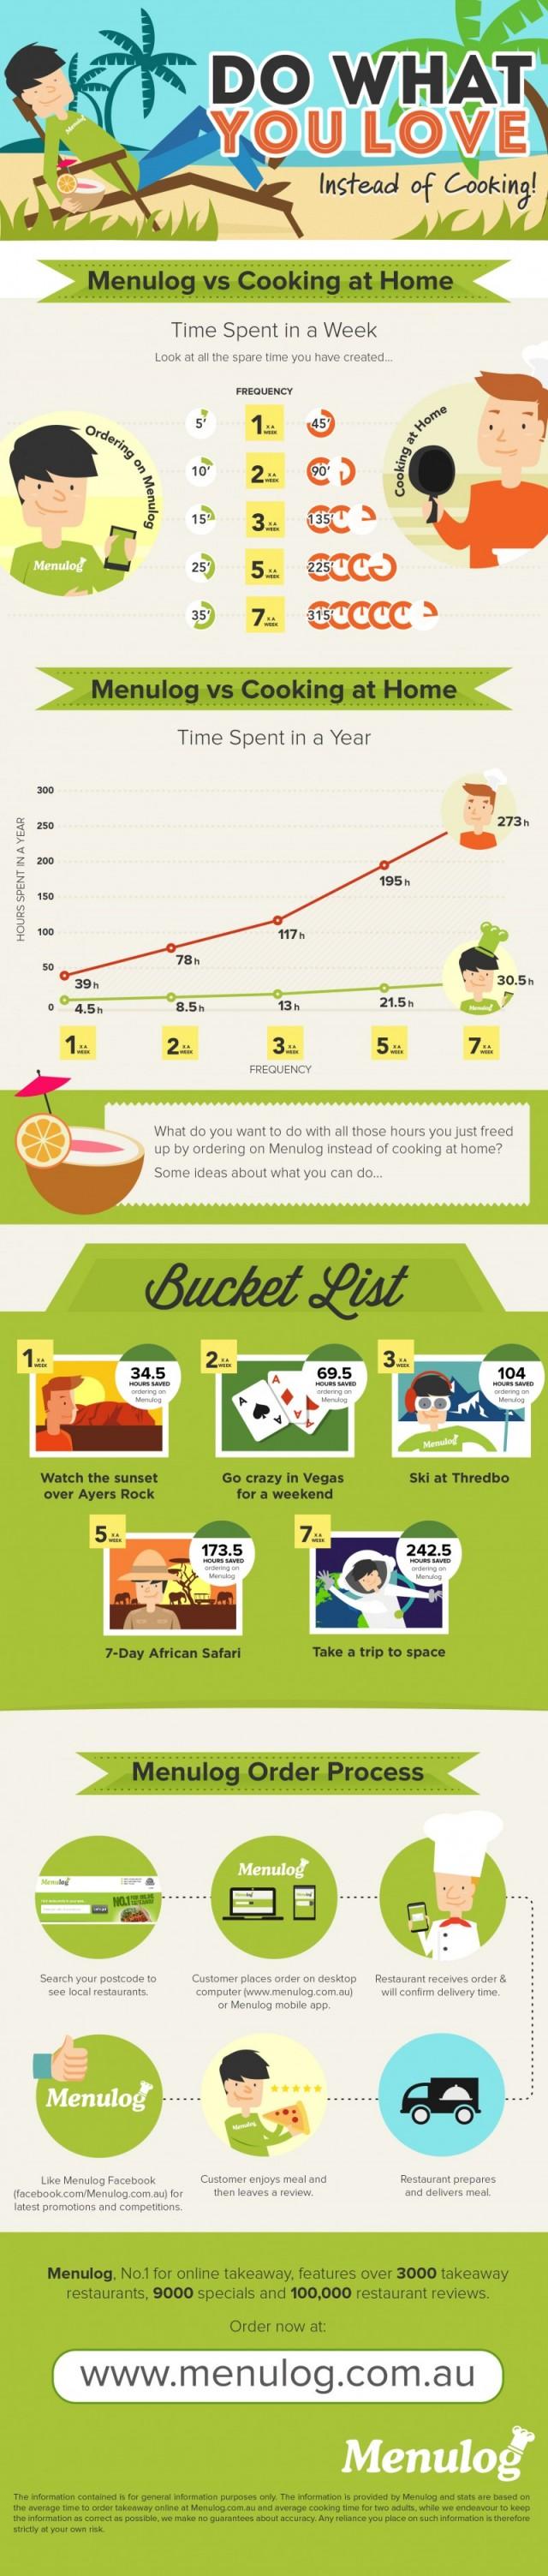 Australia - Put Takeaway On Your Bucket List